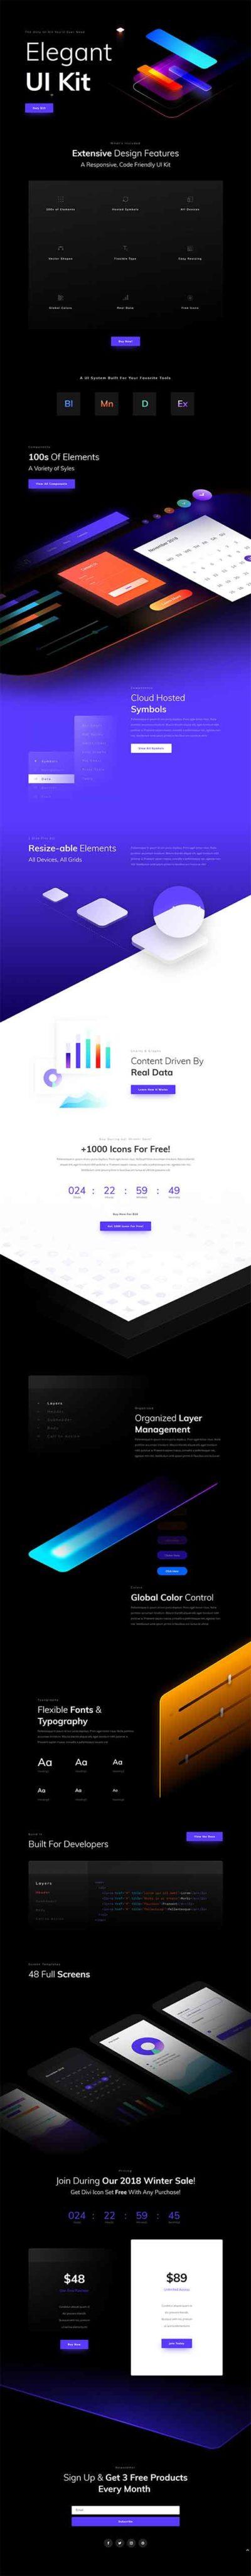 divi black friday UI layouts